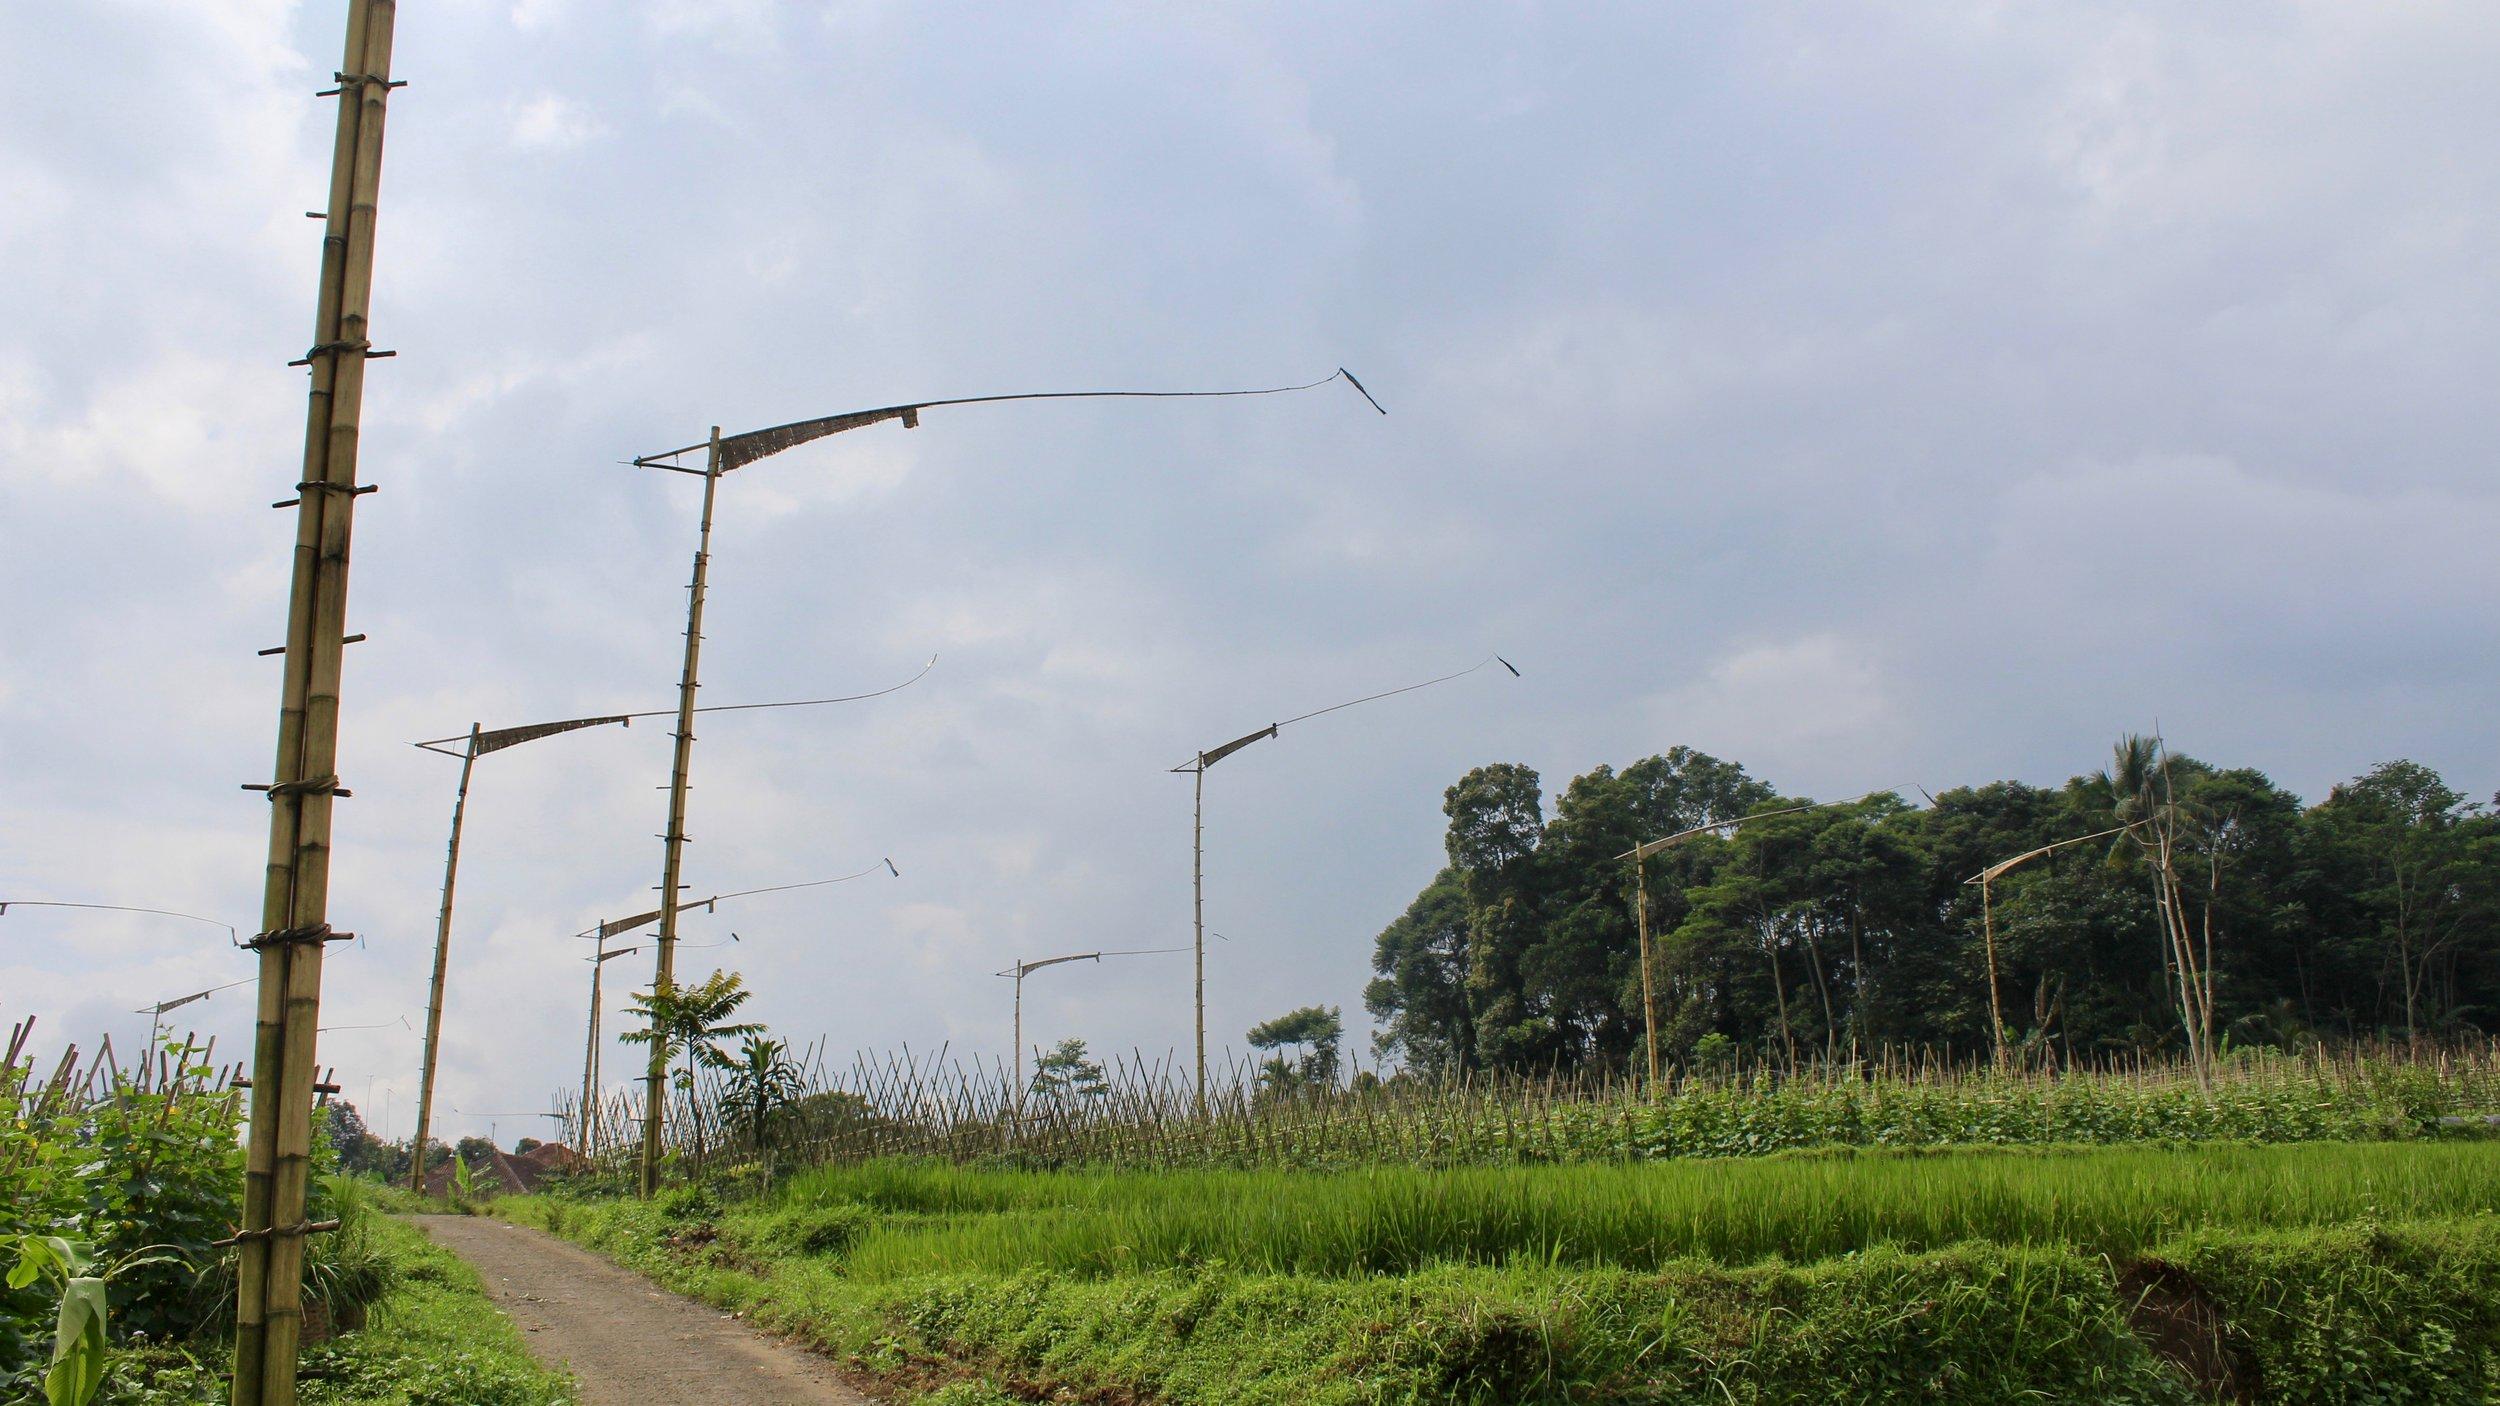 Banceuy's  kolecer  windmills line the rice paddies